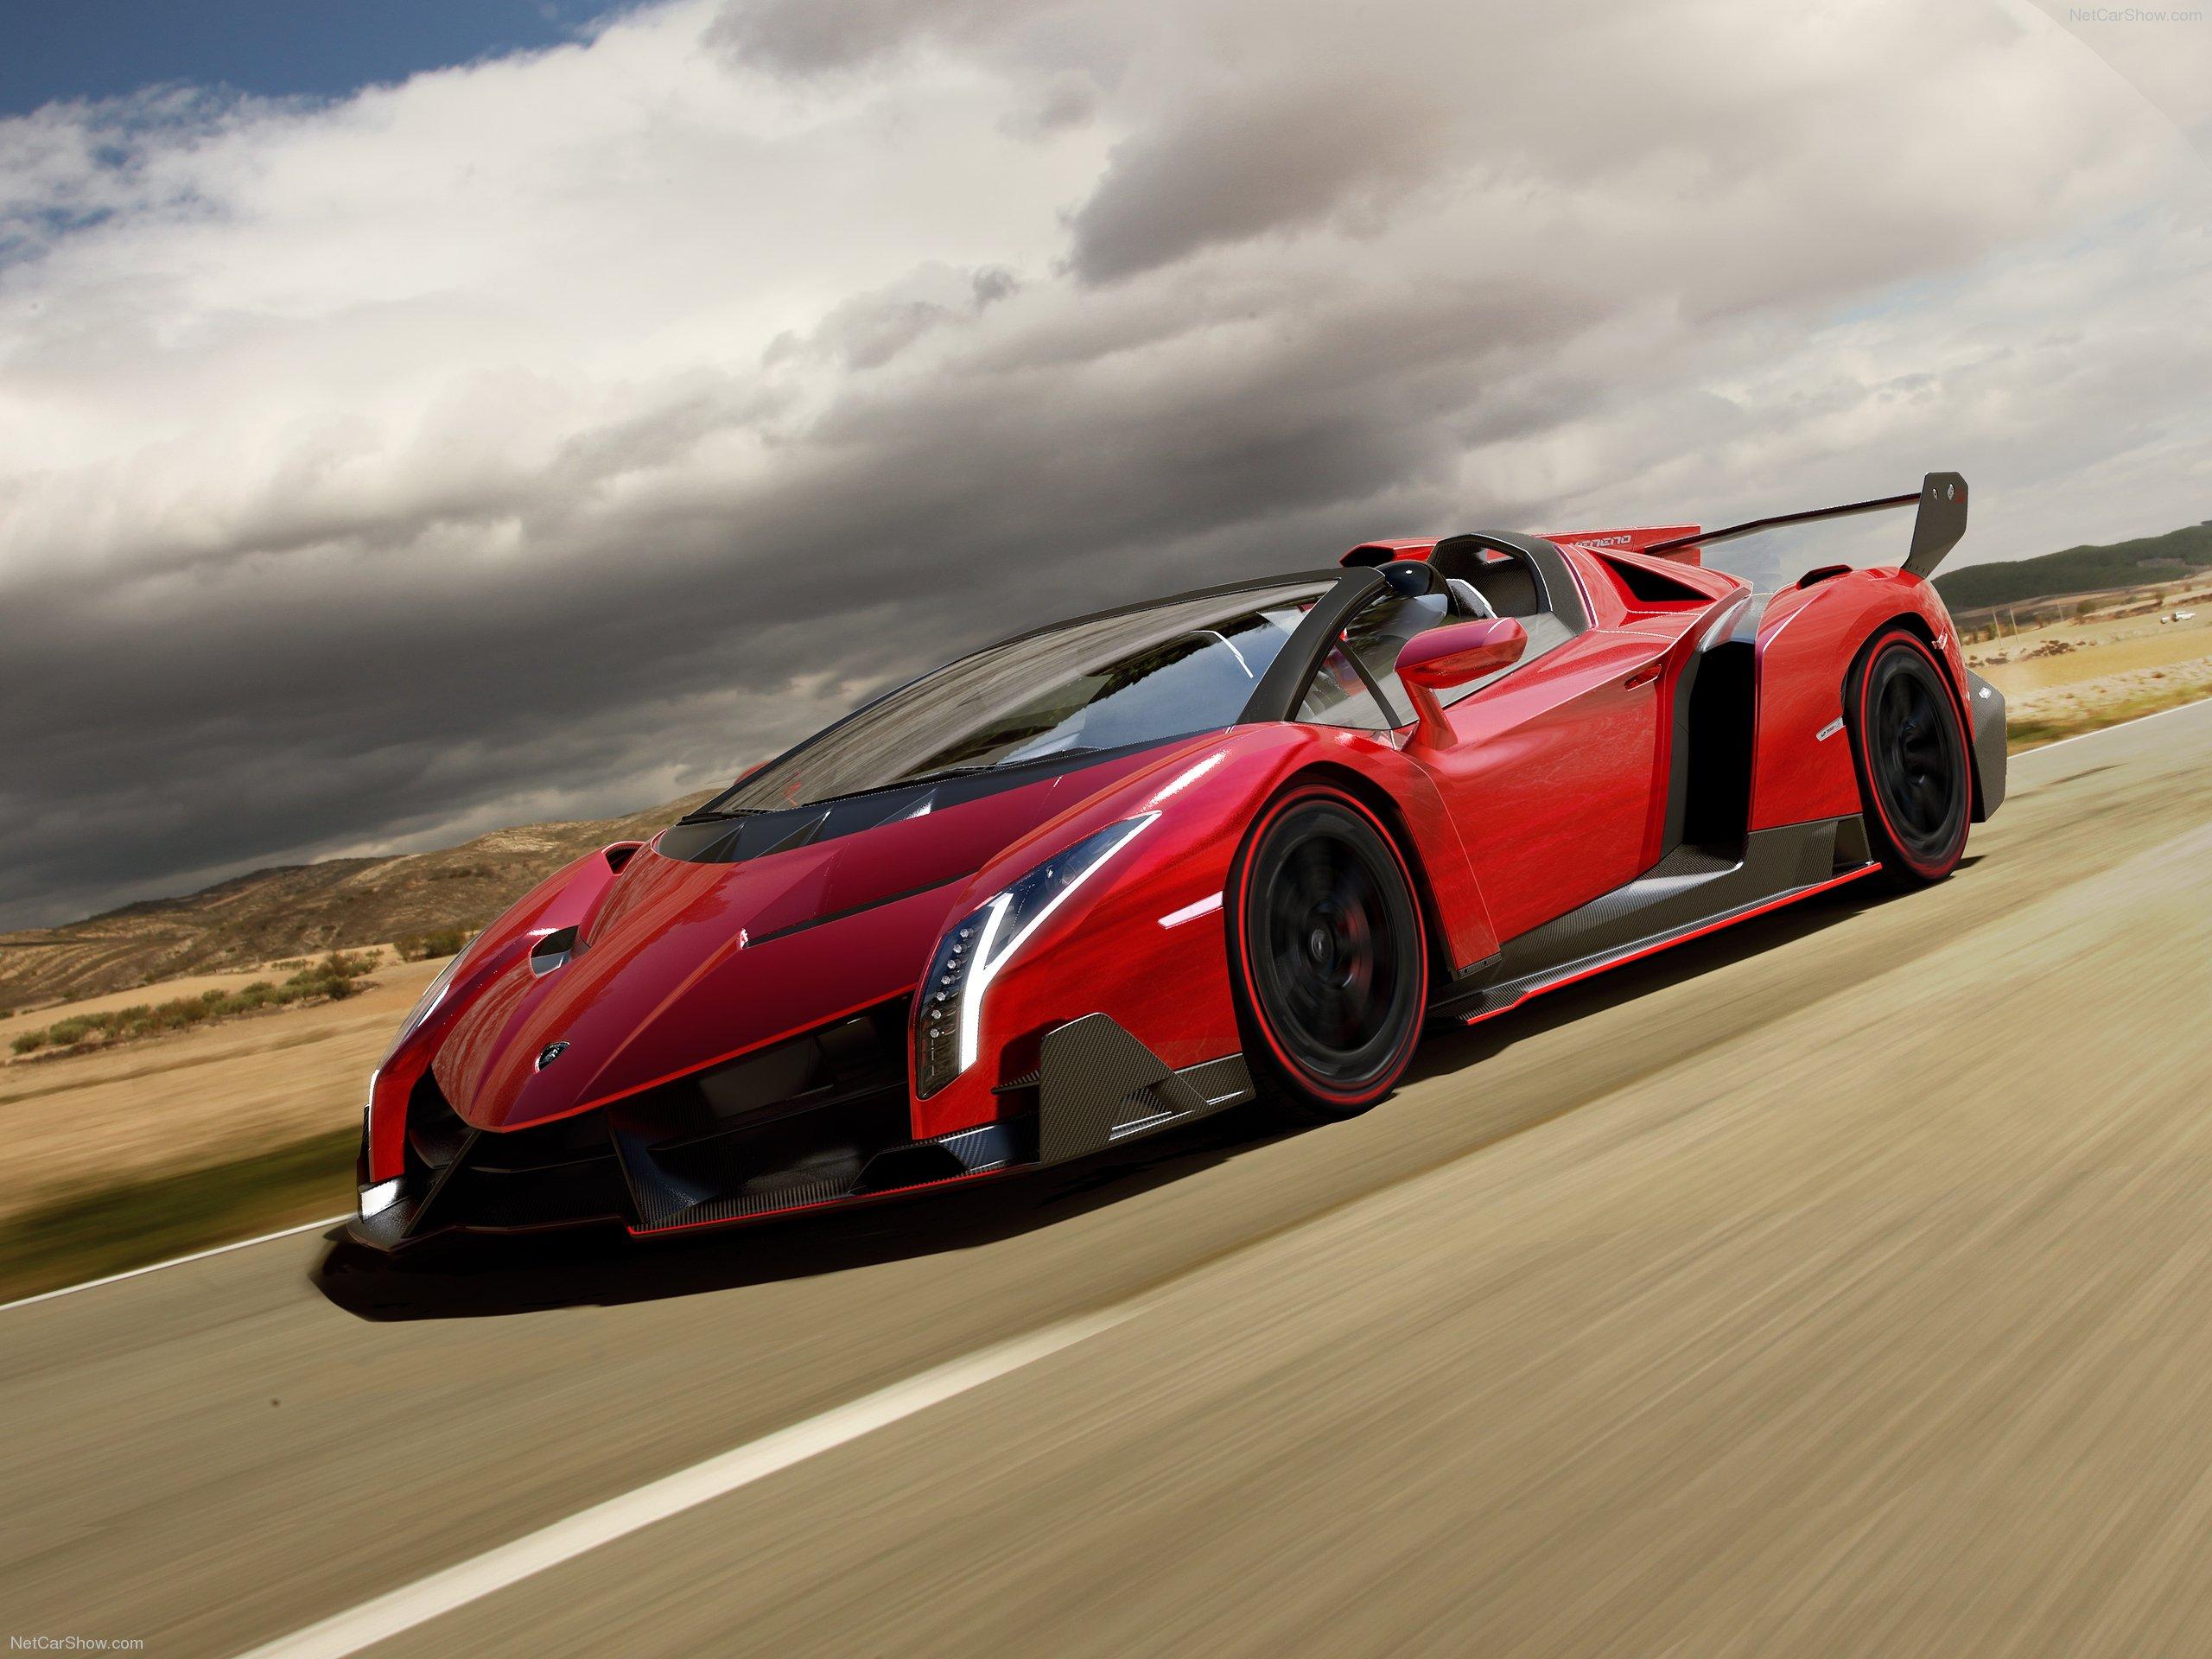 Fondos De Vehiculos: Lamborghini Veneno Fondos De Pantalla, Fondos De